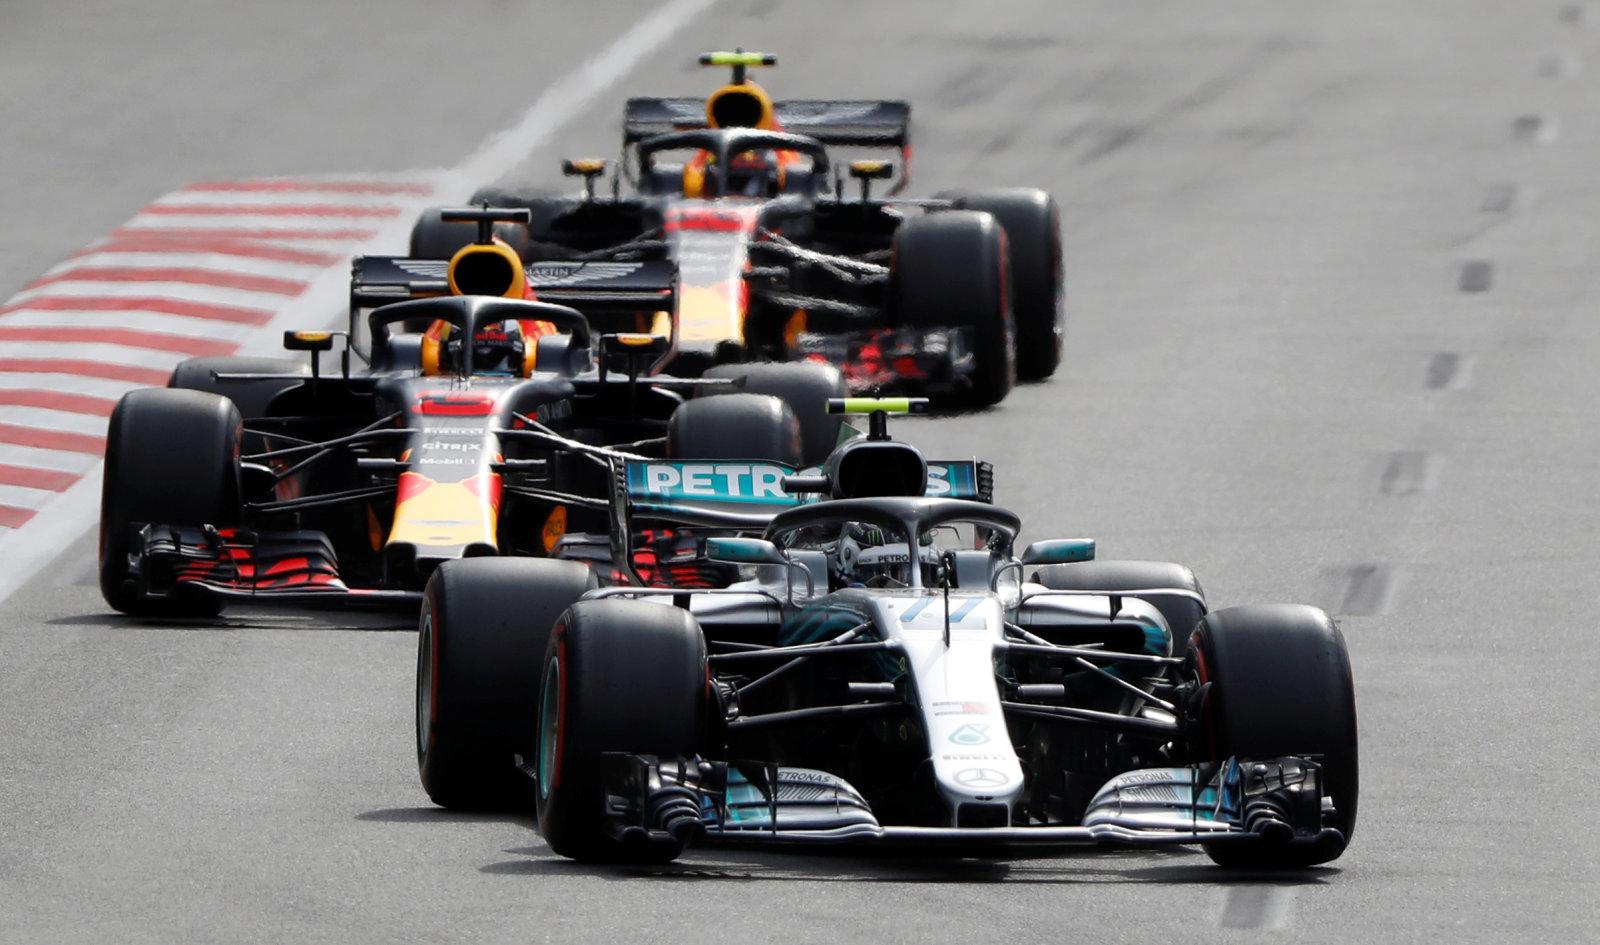 Formula One - F1 - Azerbaijan Grand Prix - Baku City Circuit, Baku, Azerbaijan - April 29, 2018   Mercedes' Valtteri Bottas and Red Bull's Daniel Ricciardo in action during the race   REUTERS/David Mdzinarishvili